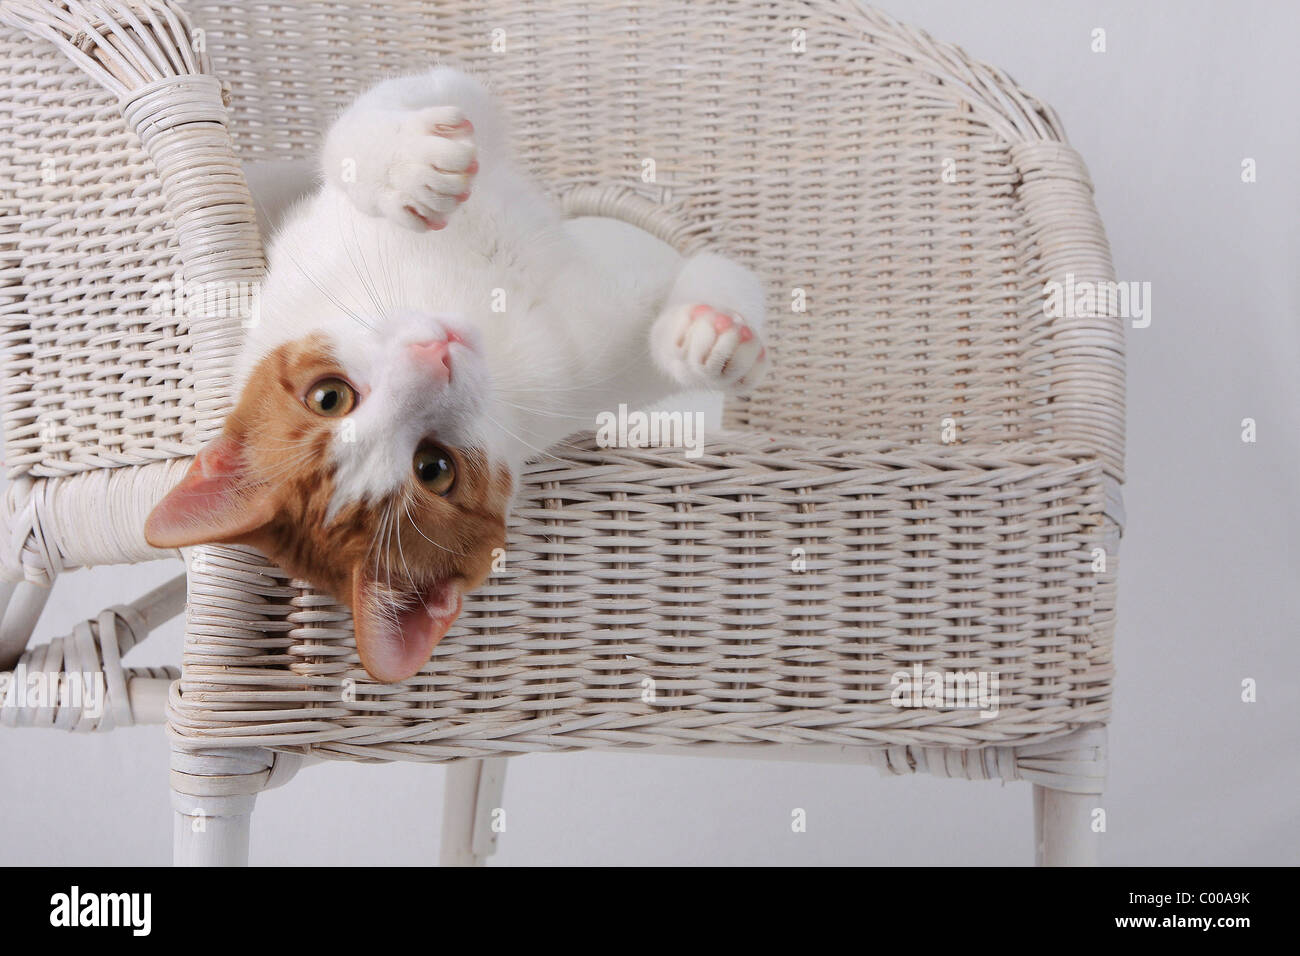 Hauskatze, dunkelrot-weiss, liegende, Felis silvestris forma catus, Domestic-cat, red-white, lying - Stock Image